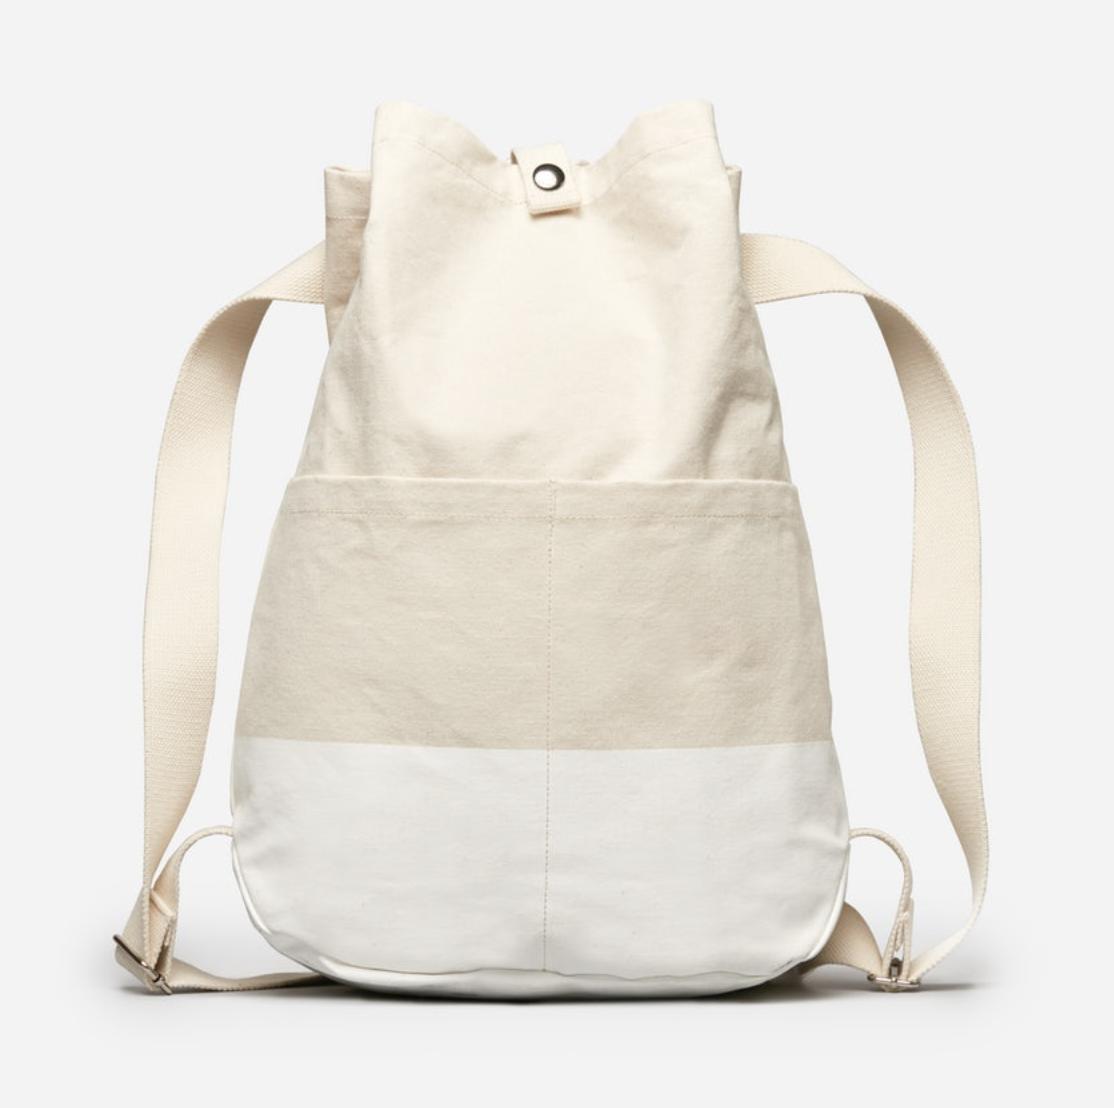 Everlane Backpack, $40